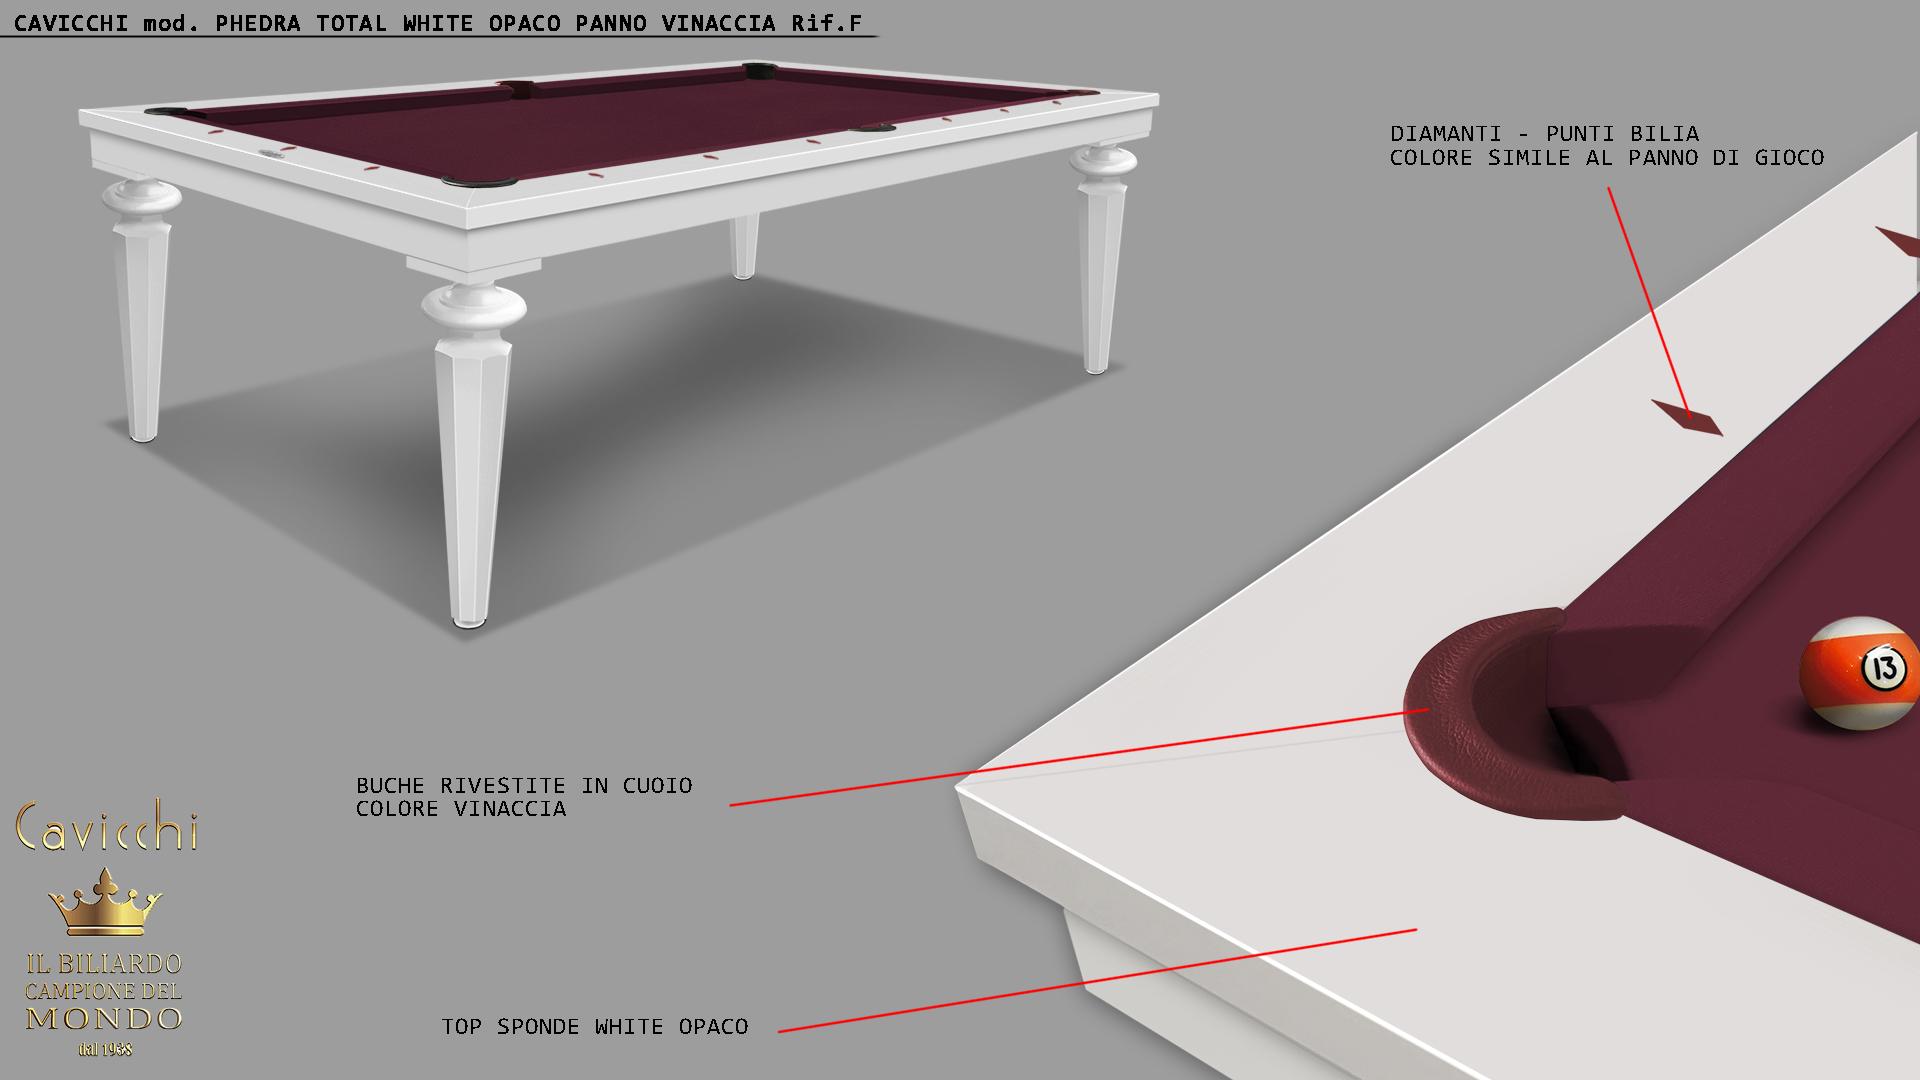 Бильярдный стол Cavicchi PHEDRA WHITE 3